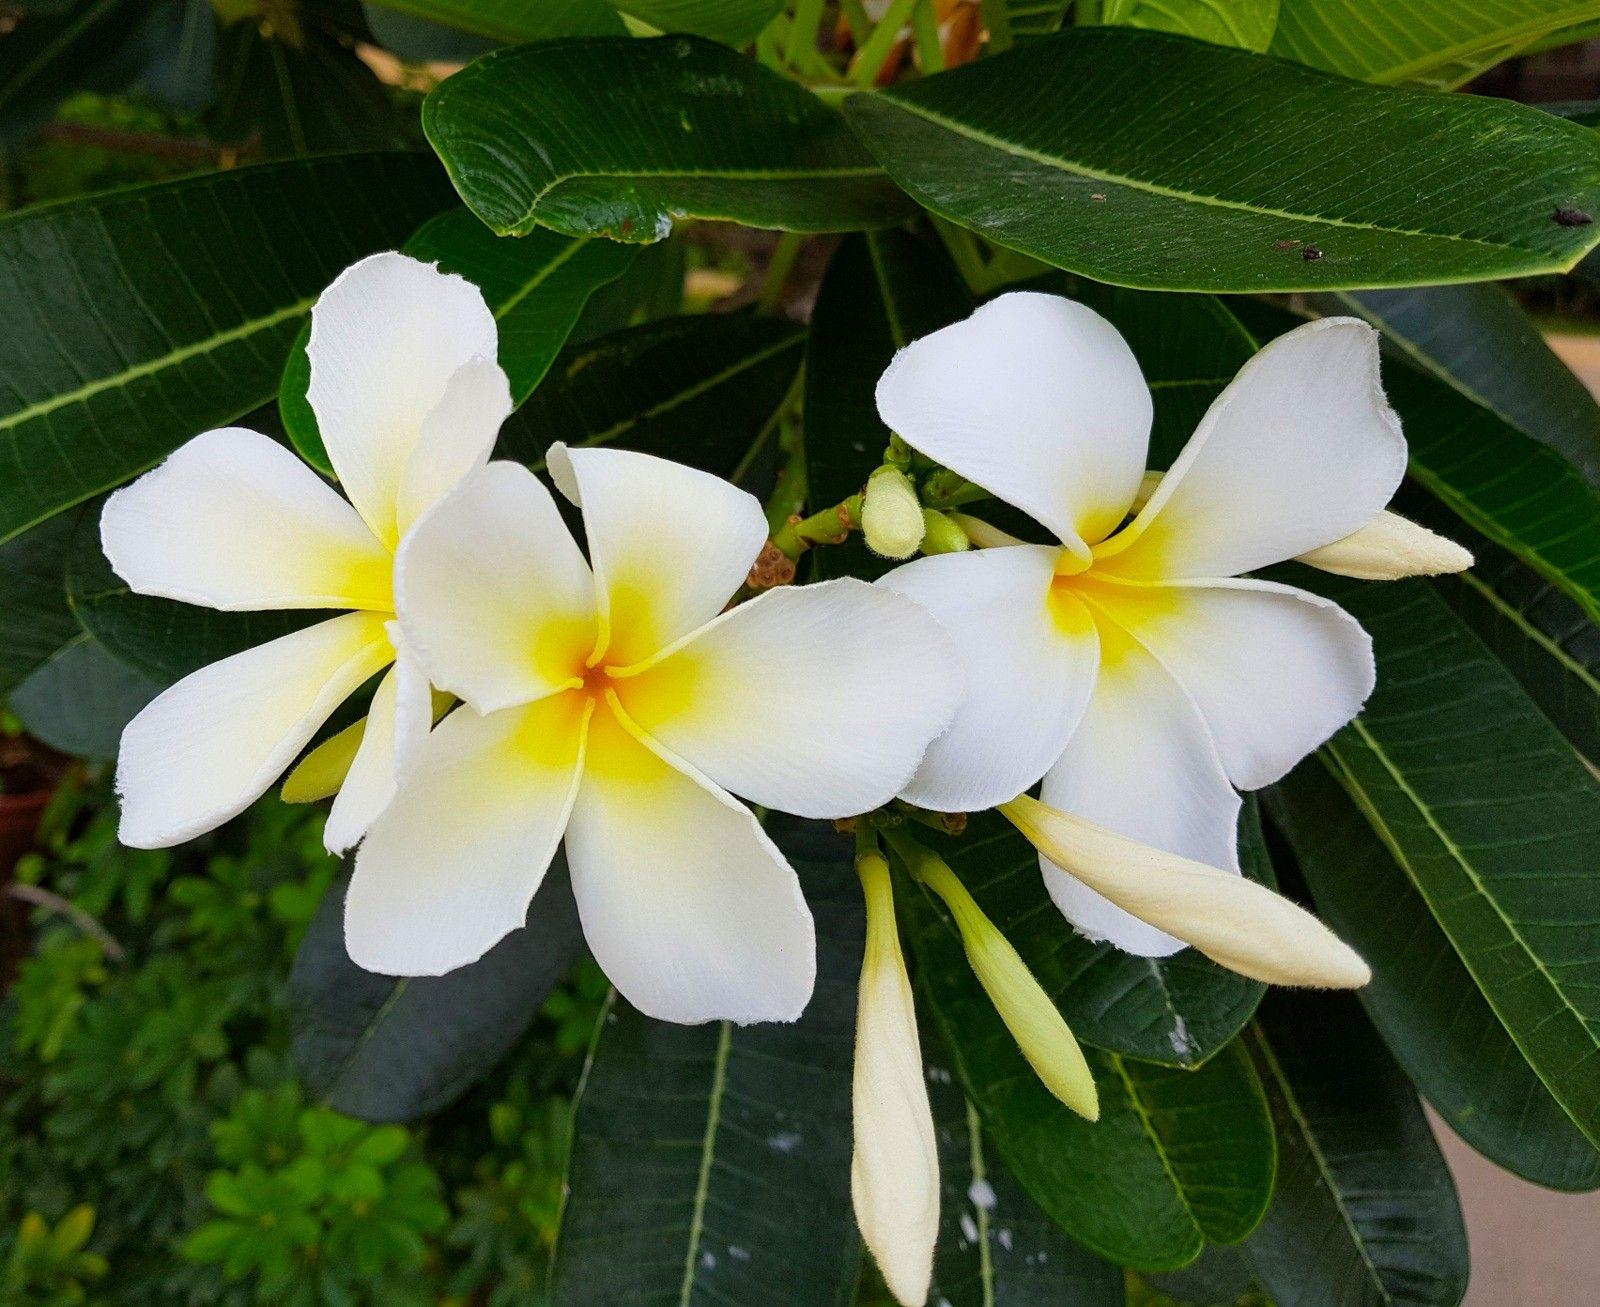 White Plumeria Fragrant Flower A Tropical Deciduous Flowering Shrub Floweringplant Plumeria Flowers Flower Flower Pots Sympathy Flowers Flower Pot Design